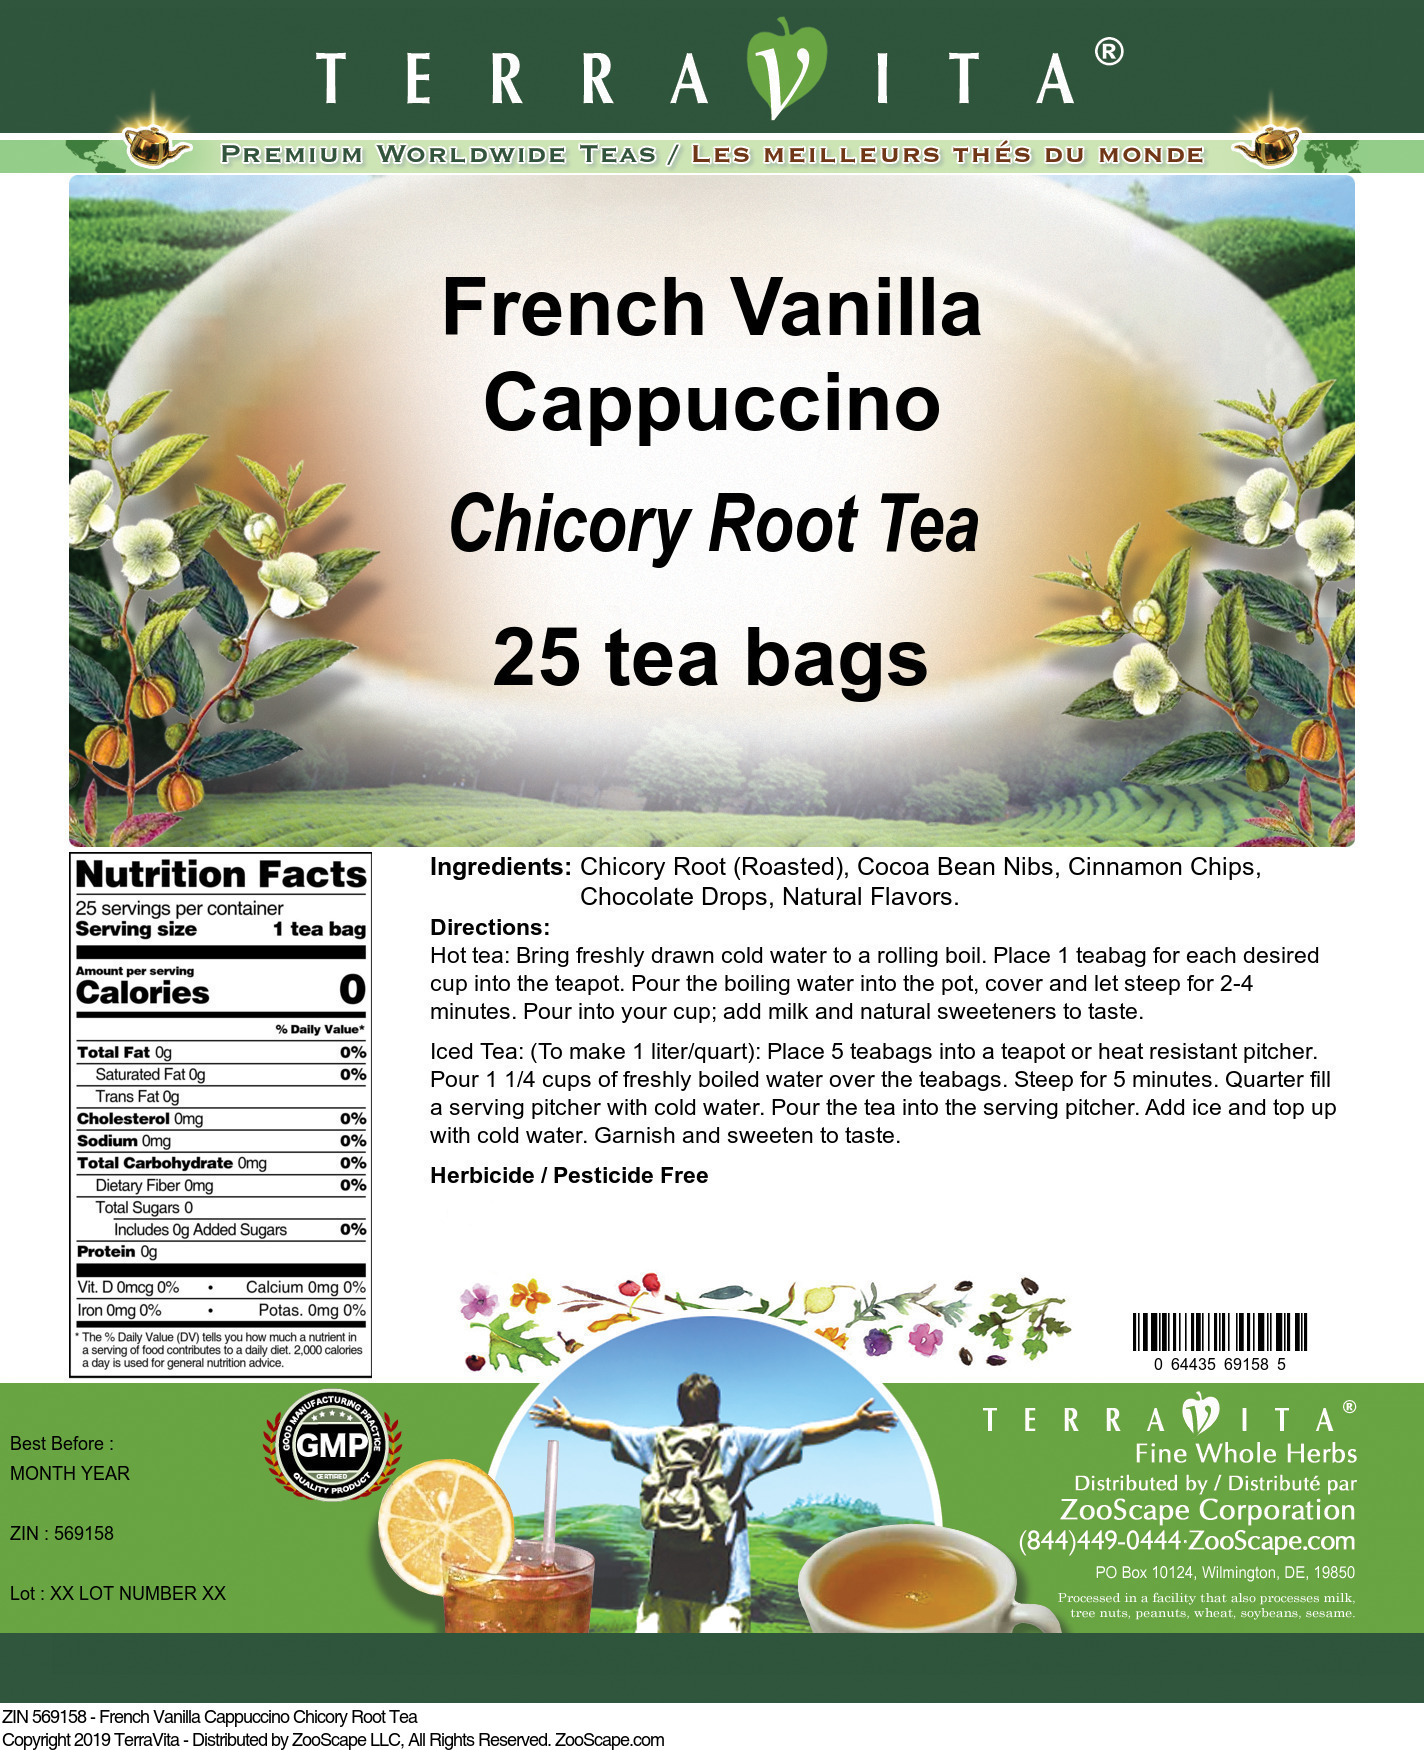 French Vanilla Cappuccino Chicory Root